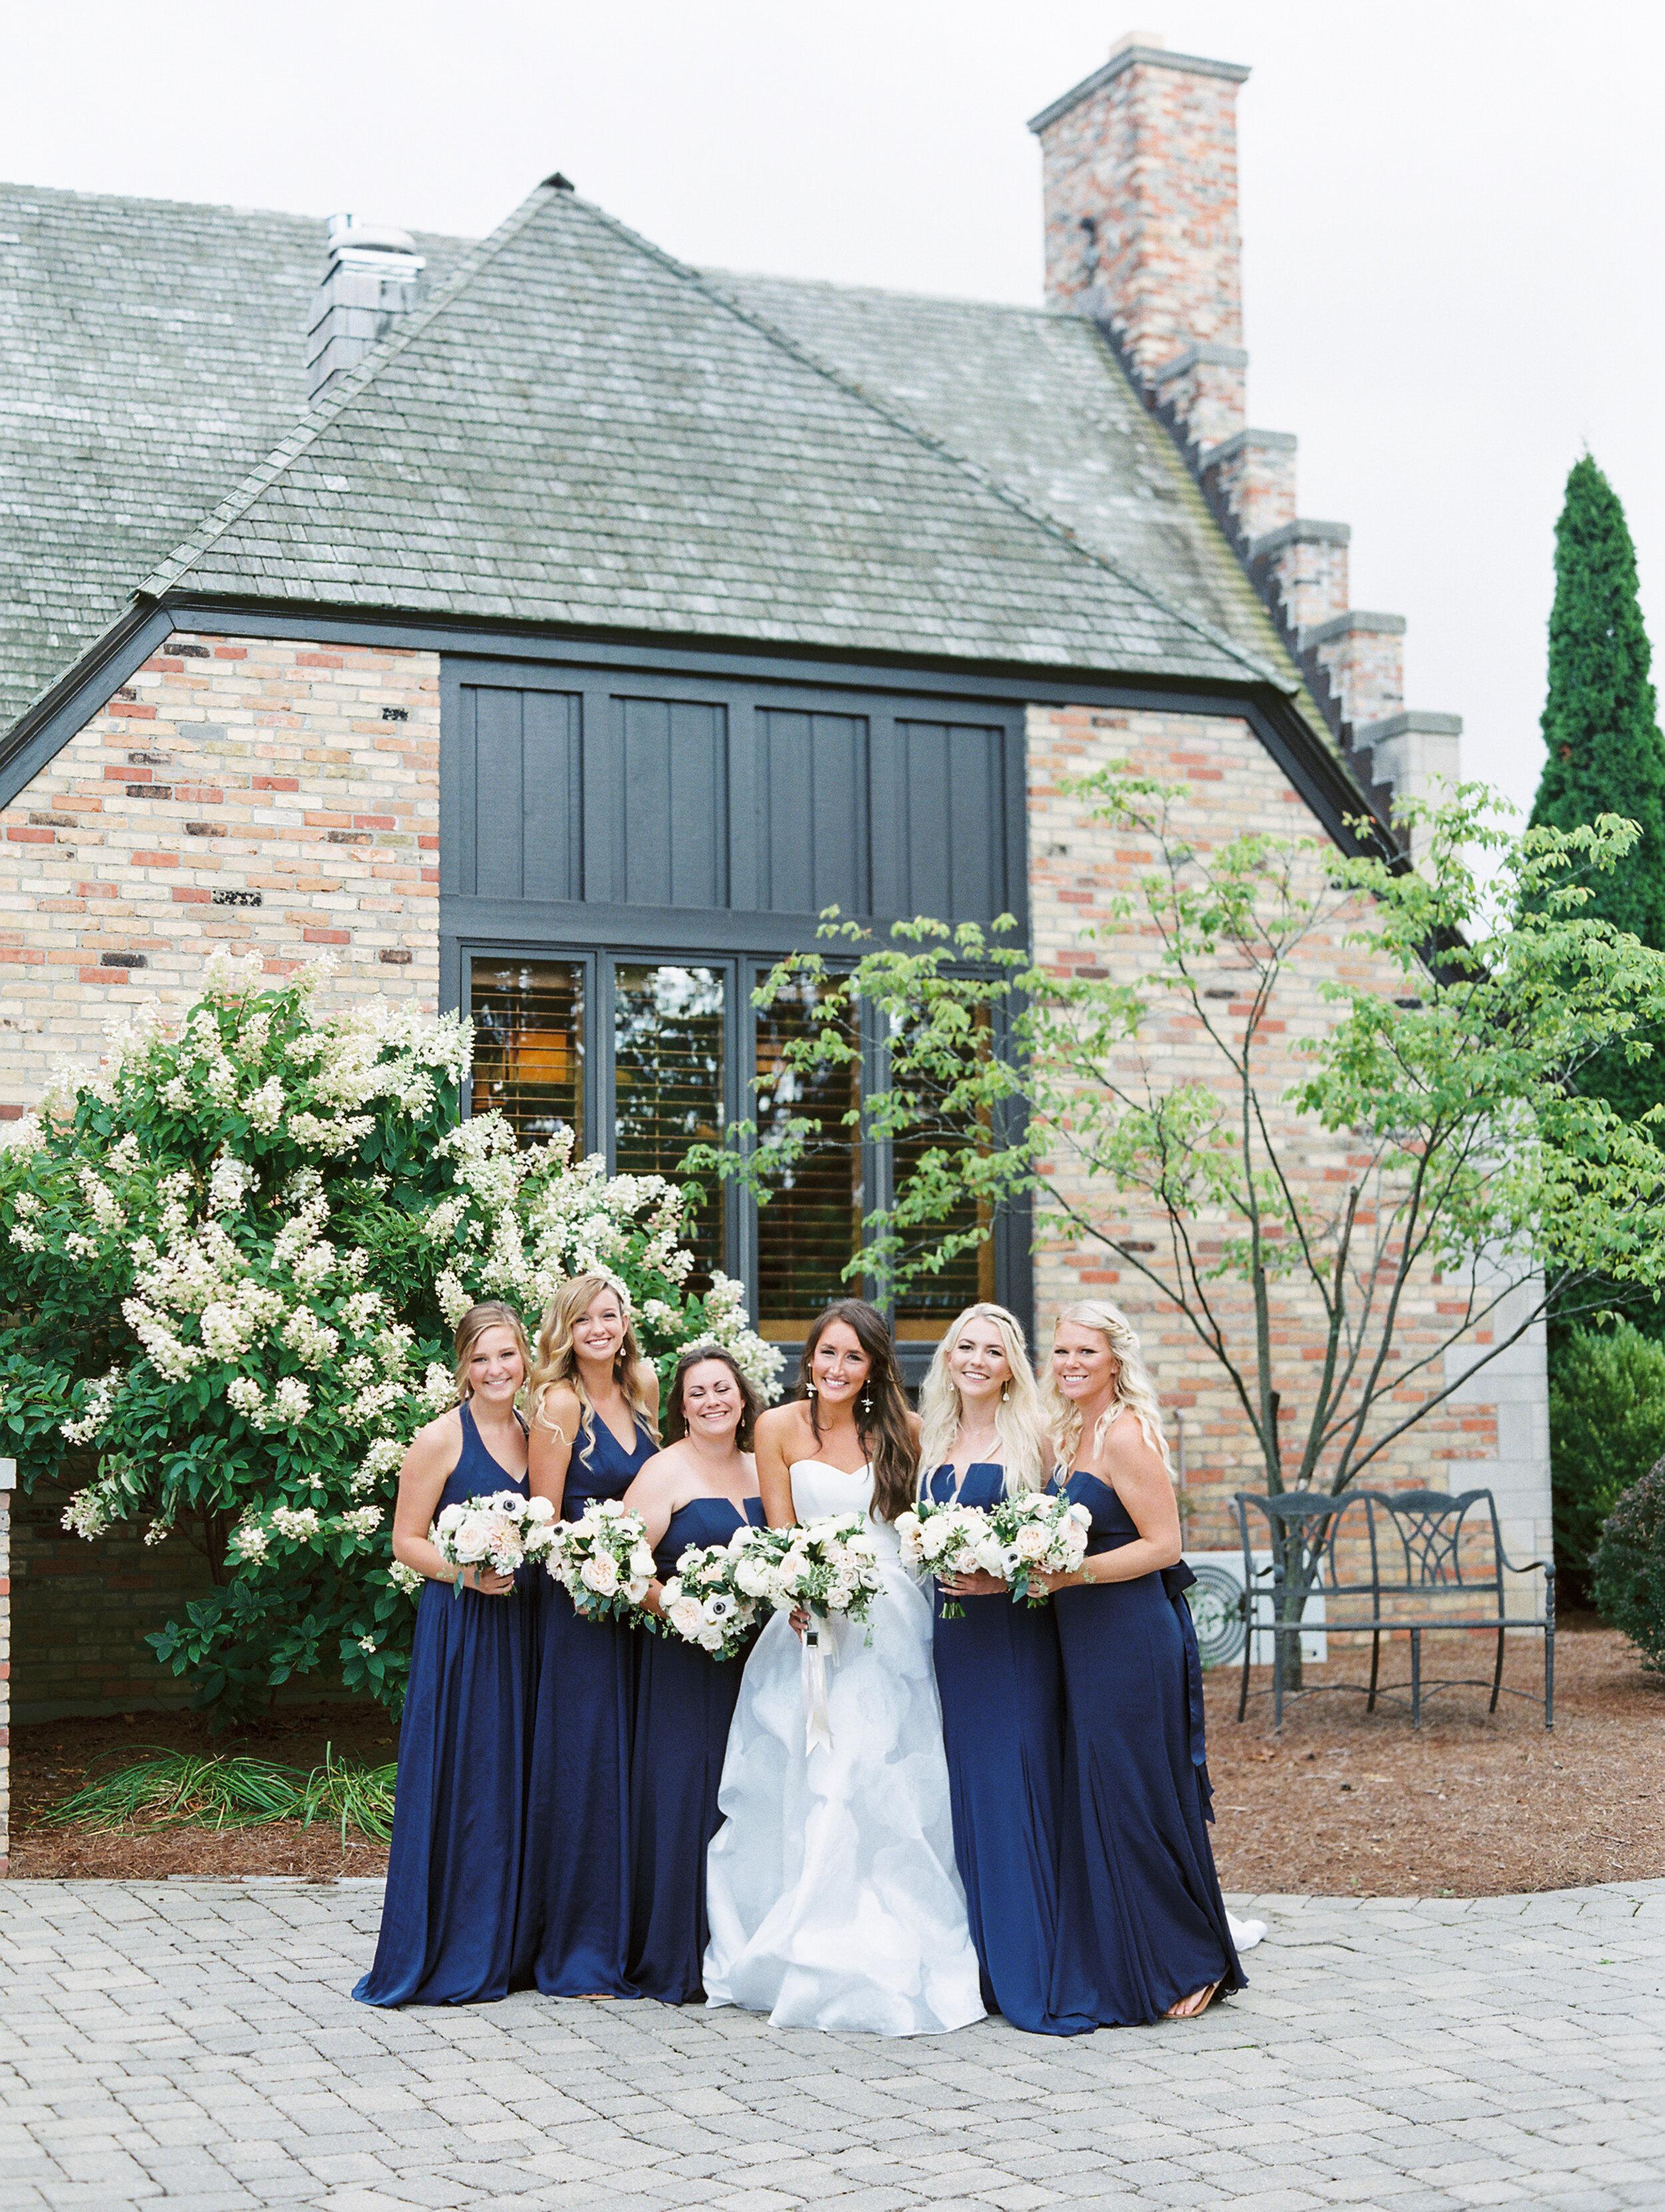 Kuiper+Wedding+Reception+Bridal+Party-108.jpg